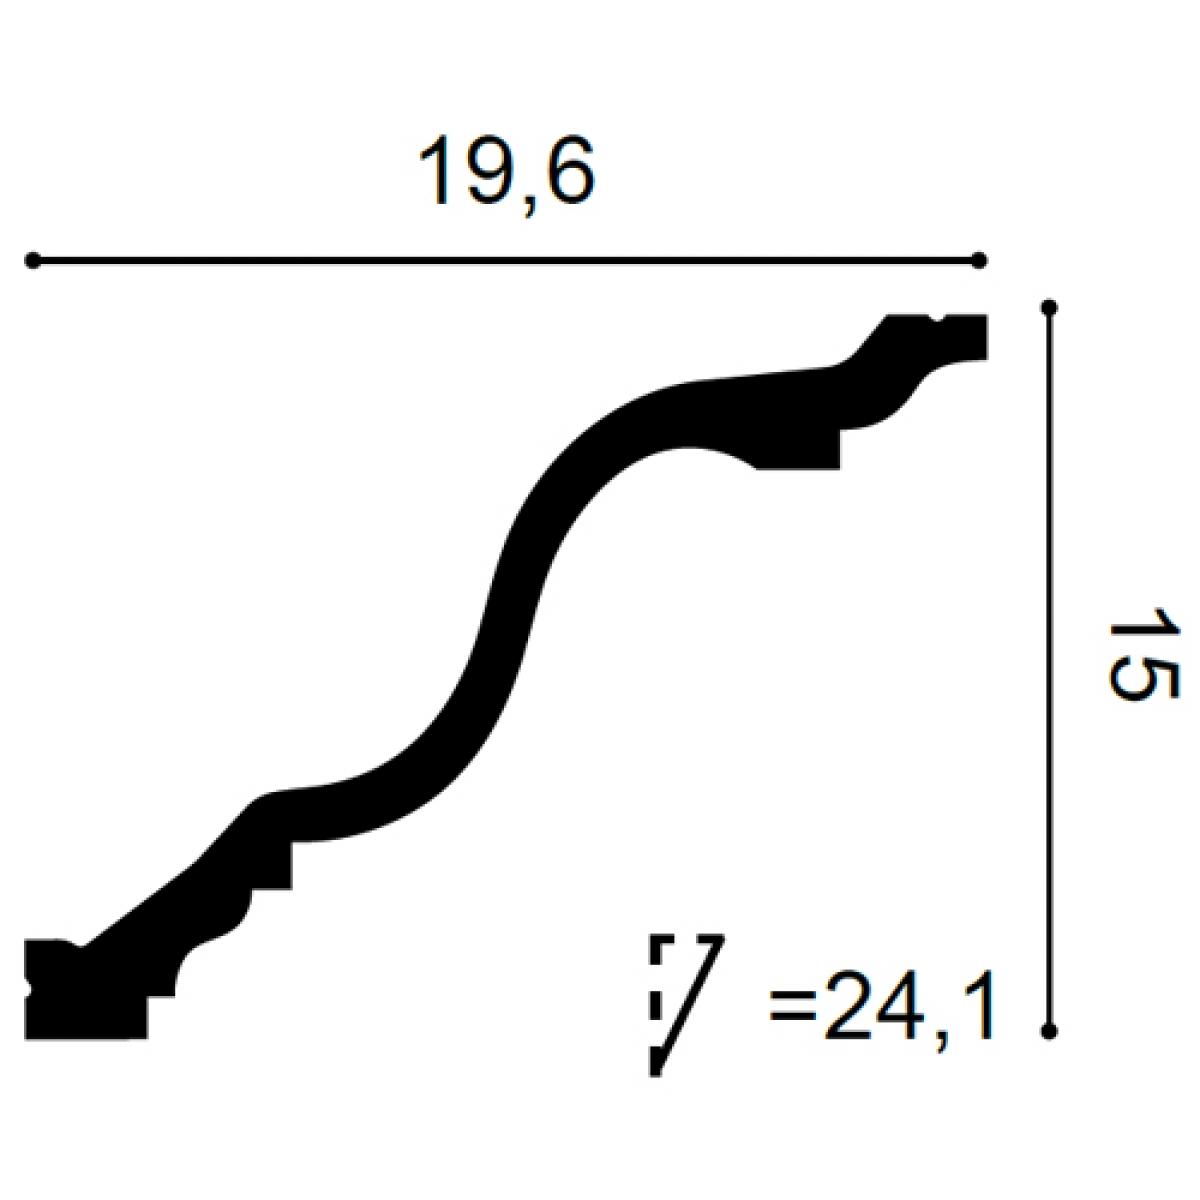 Cornisa Flex Luxxus C334F, Dimensiuni: 200 X 15 X 19.6 cm, Orac Decor